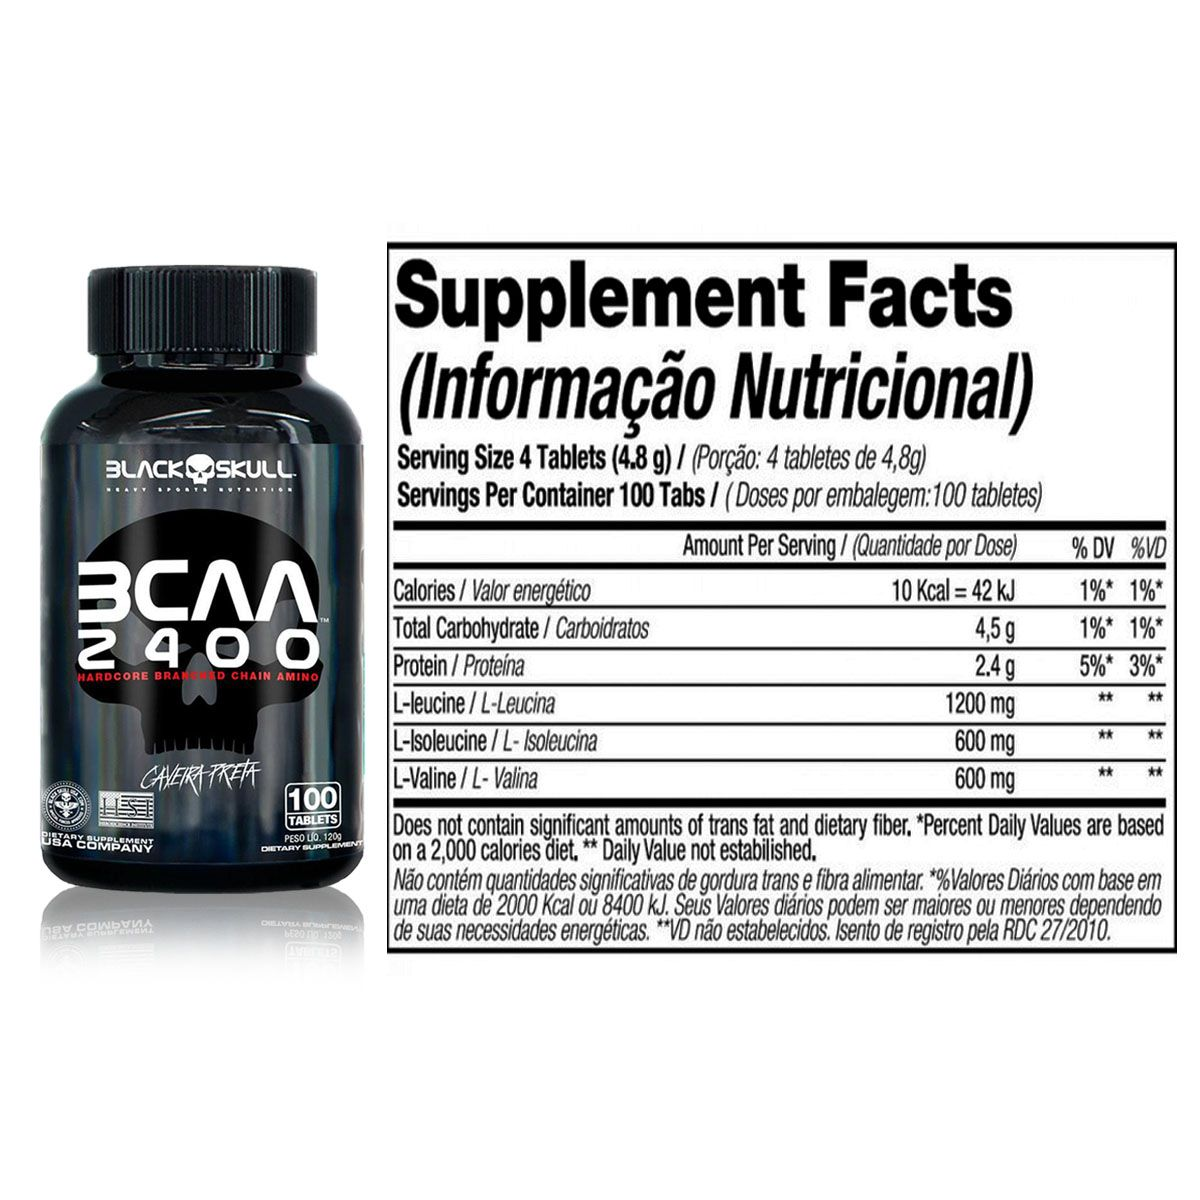 Kit Protein 7 Blend 837g + Depth-7 100g + BCAA 2400 100 Tabletes + Coqueteleira - Black Skull